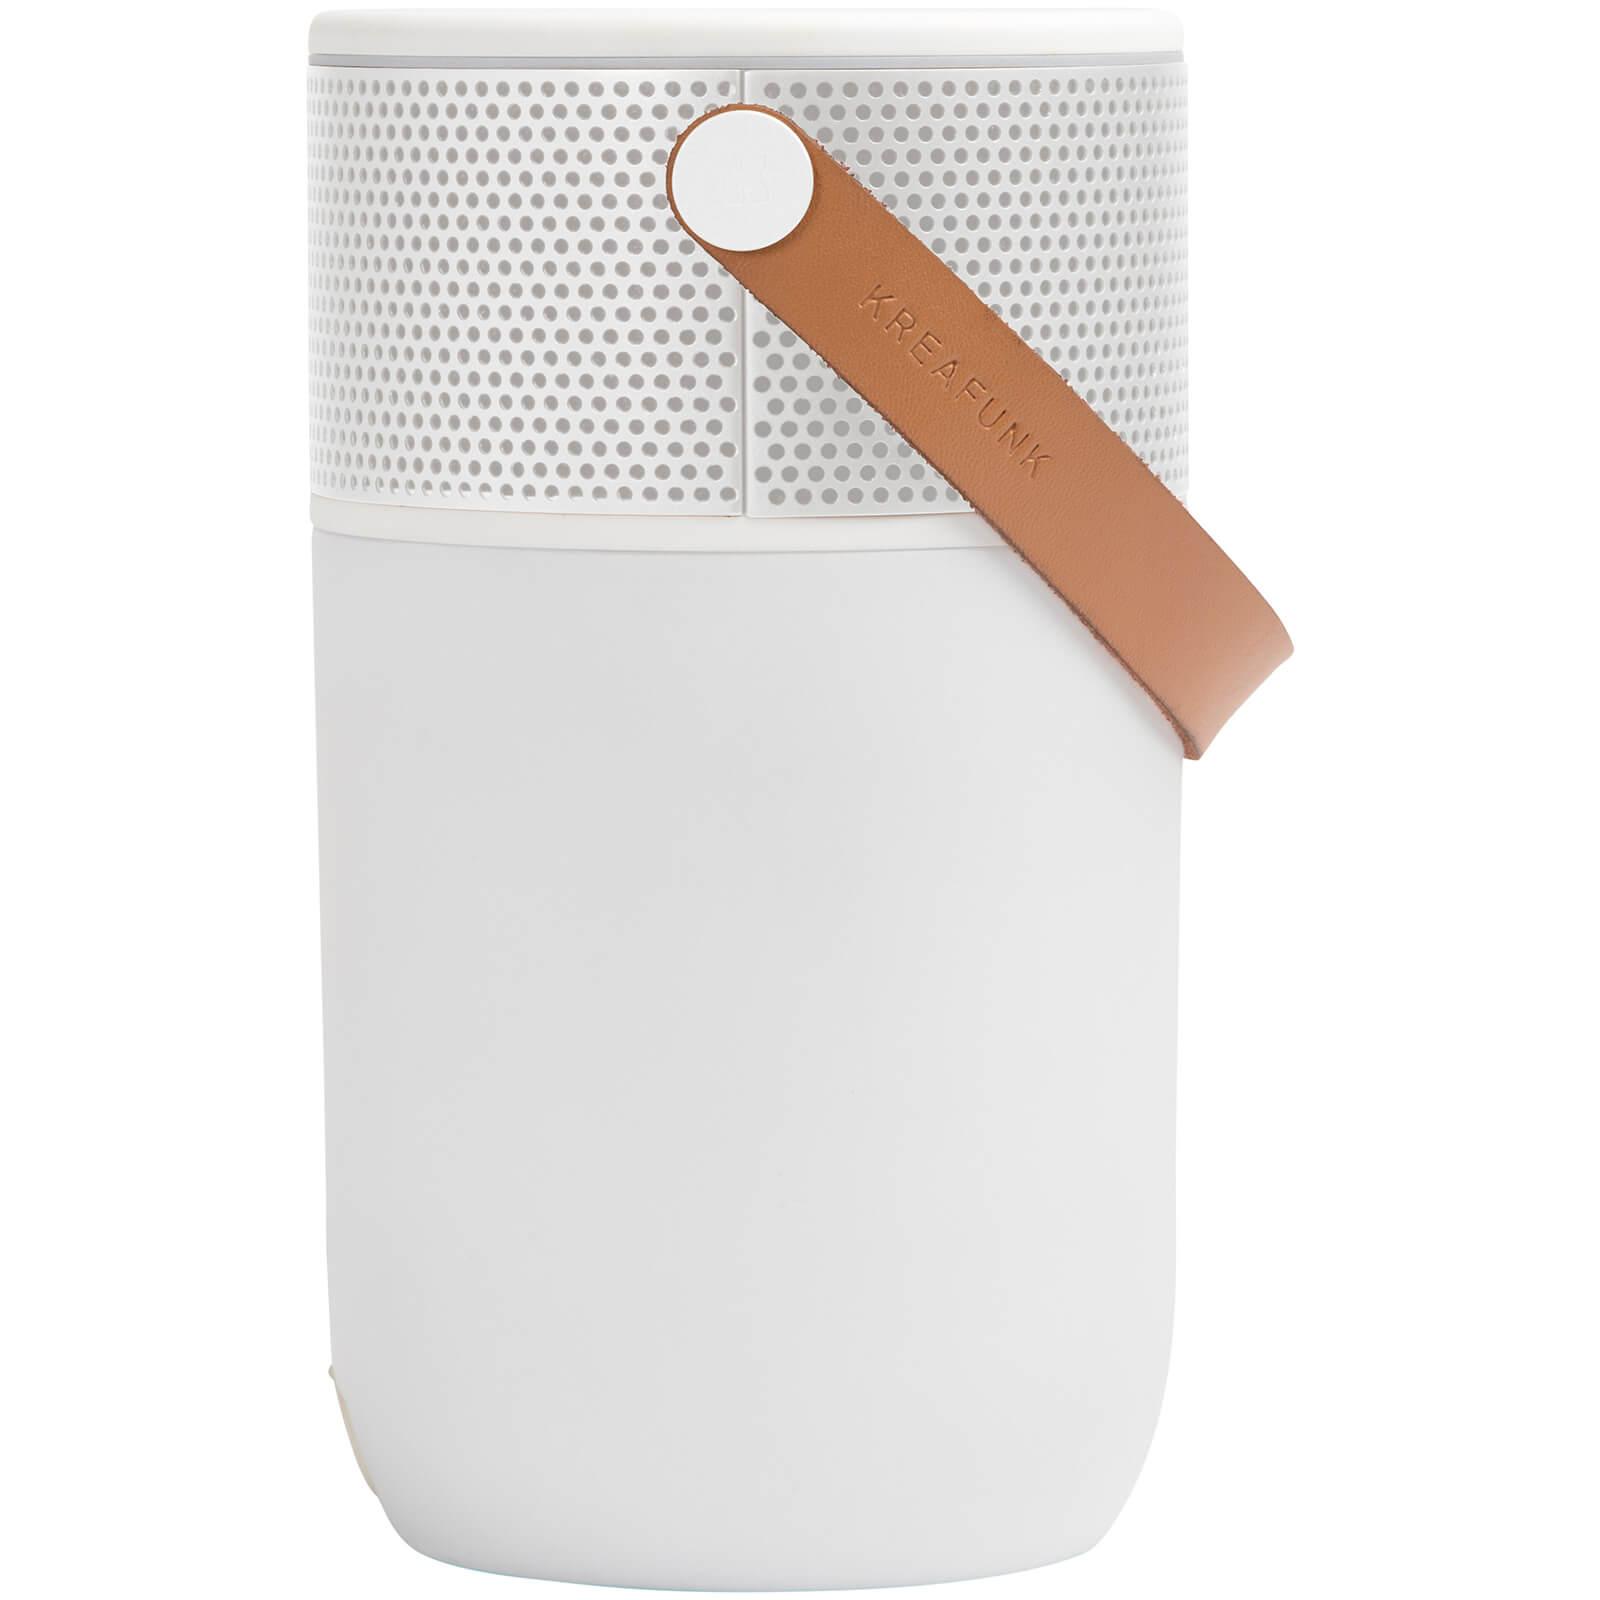 Kreafunk aGLOW Multifunctional Bluetooth Speaker - White